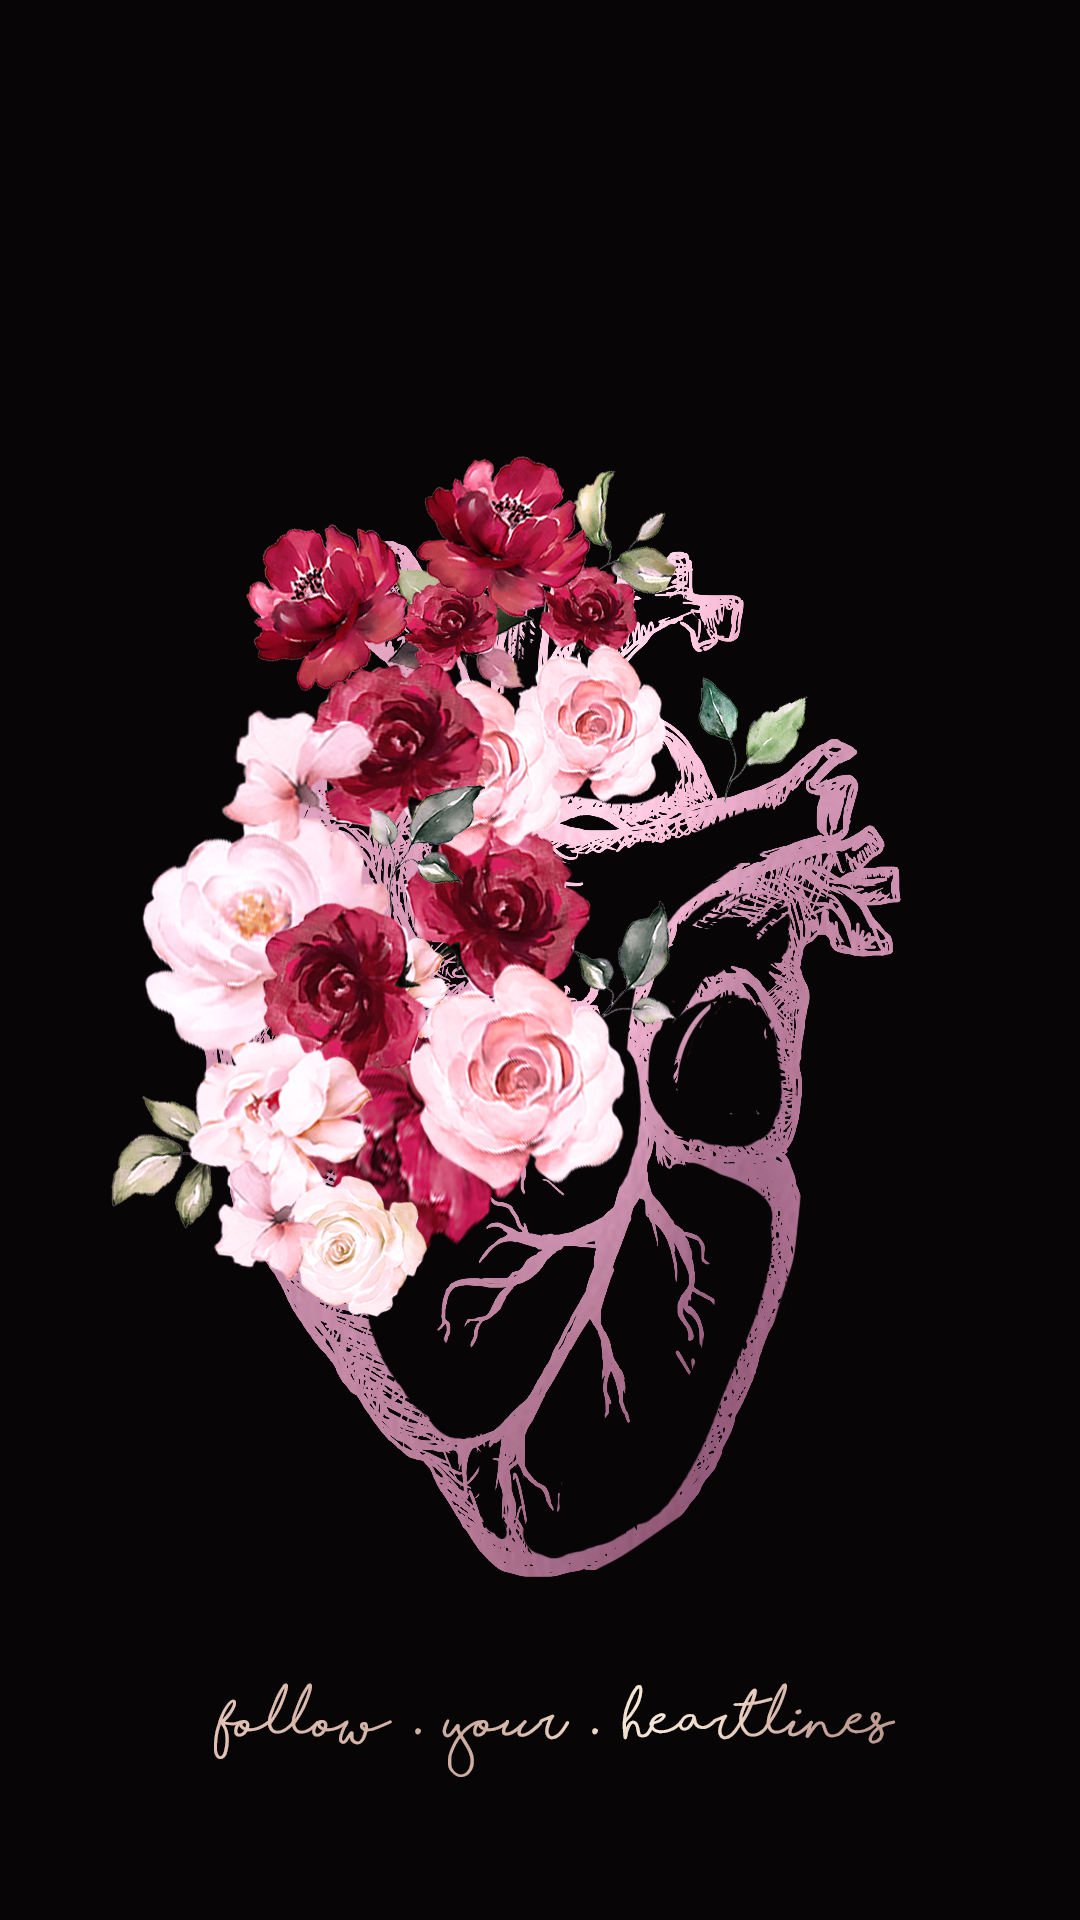 Wallpaper Coração de Flores 2 by Gocase, flowers, flores, rosas, vermelho, red, roses, pink, leaves, folhas, árvores, raízes, trees, roots, nature, follow your heartlines, follow your heart, coração, corações, amor, love, wallpaper, papel de parede, fundo de tela, background, gocase, lovegocase, #wallpaper, #lovegocase, #gocase, #coração, #flores, #rosas, #followyourheart, coração, amor, casal, #wallper, #love